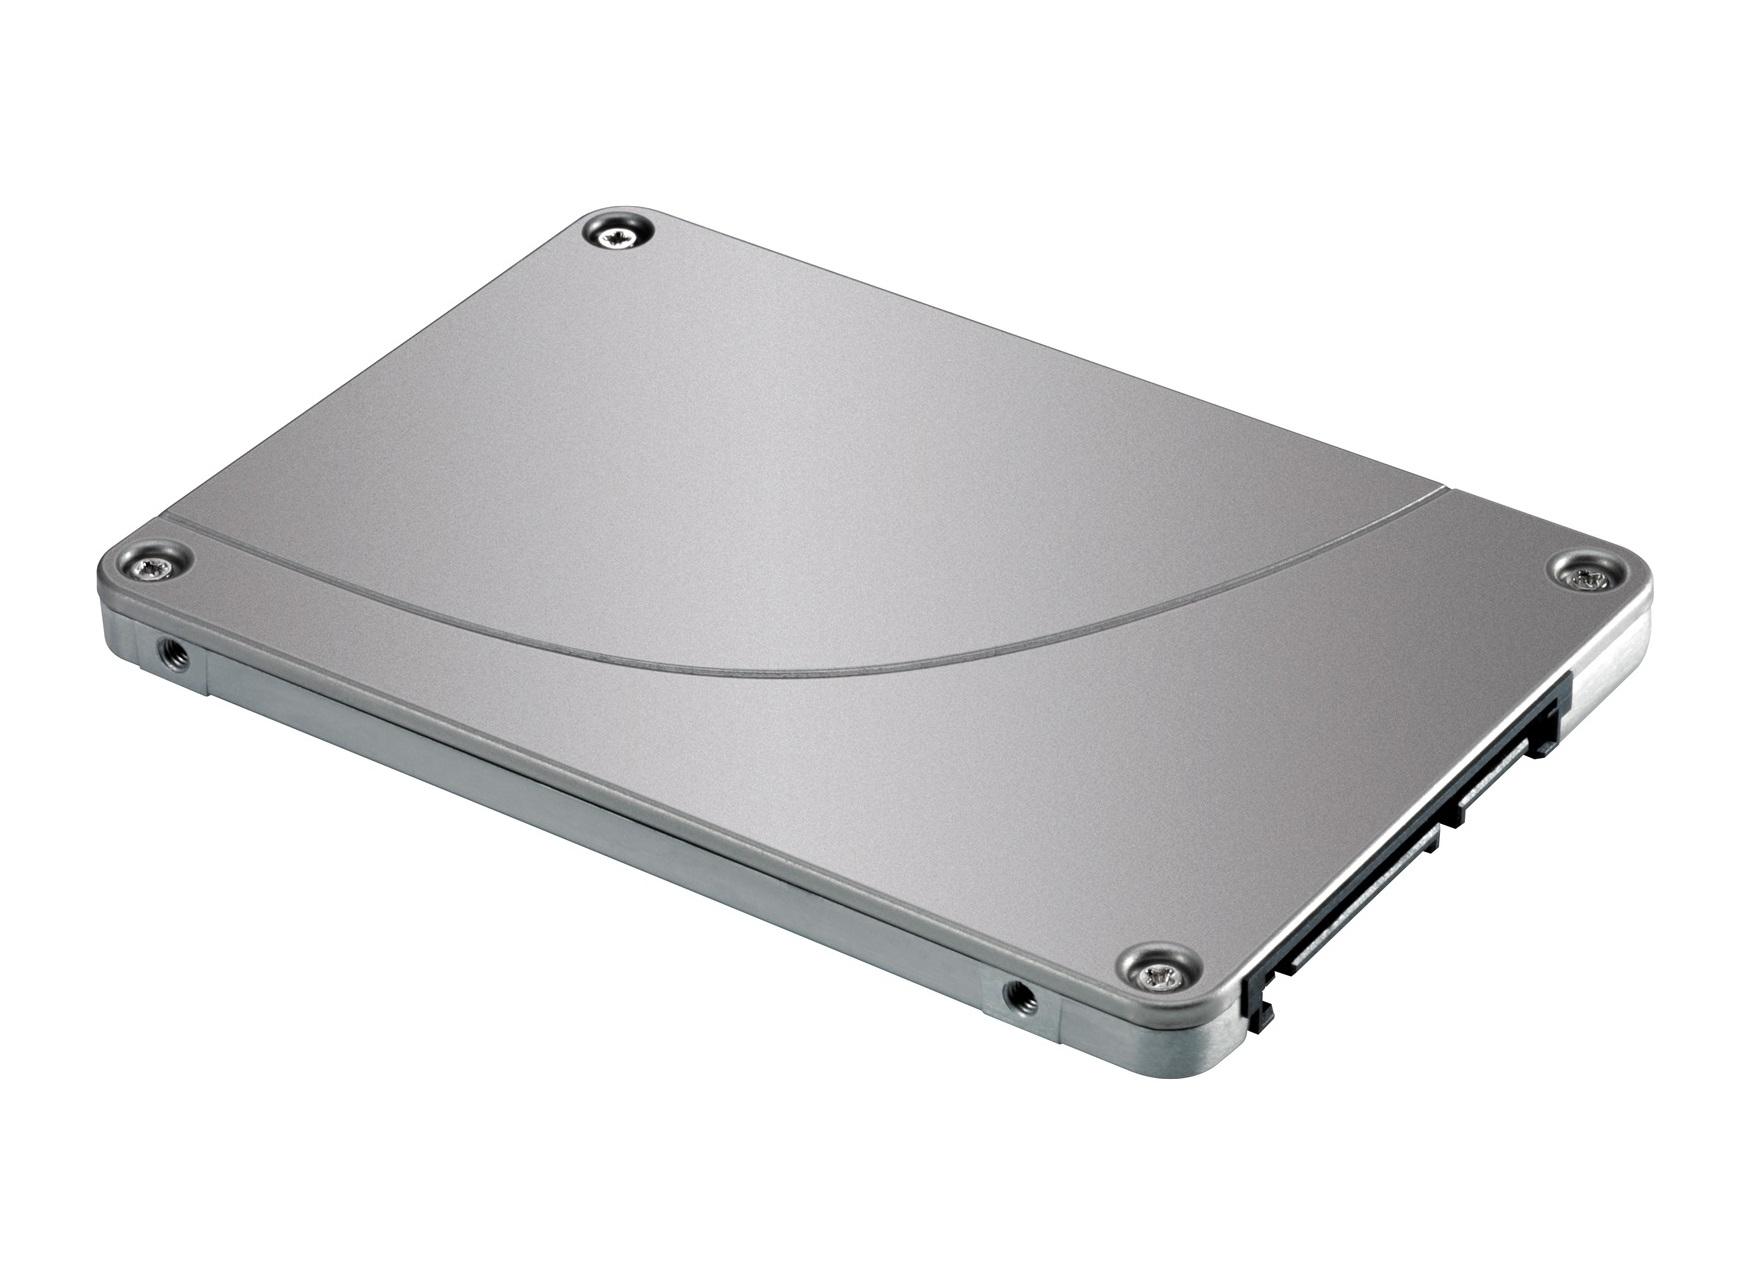 HP 256 GB SATA Value SSD Drive